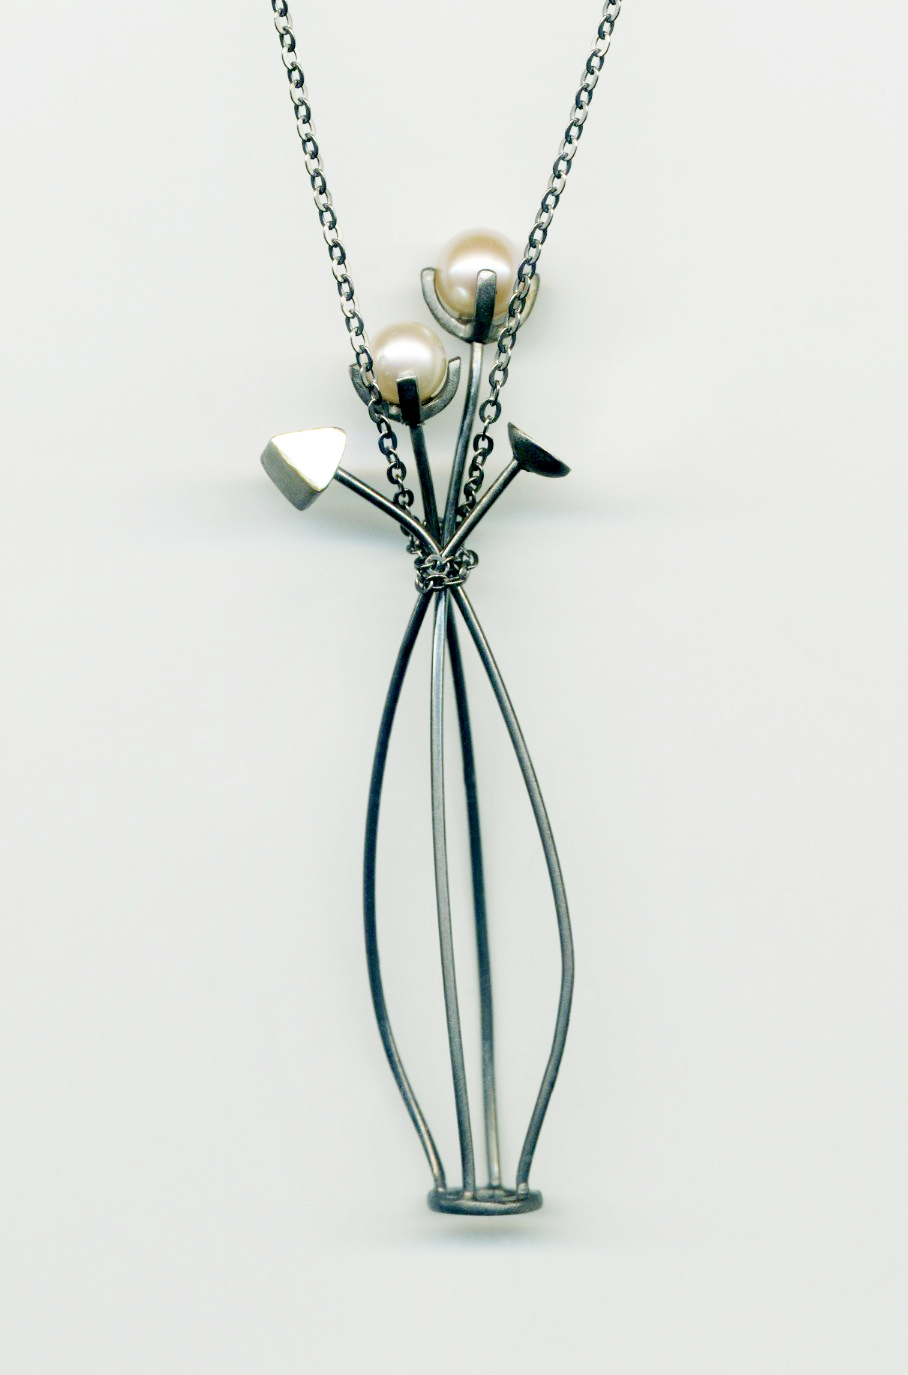 Silvia Piva pendant c282 bouquet perlas_ag+au+rodio+perlas.jpg